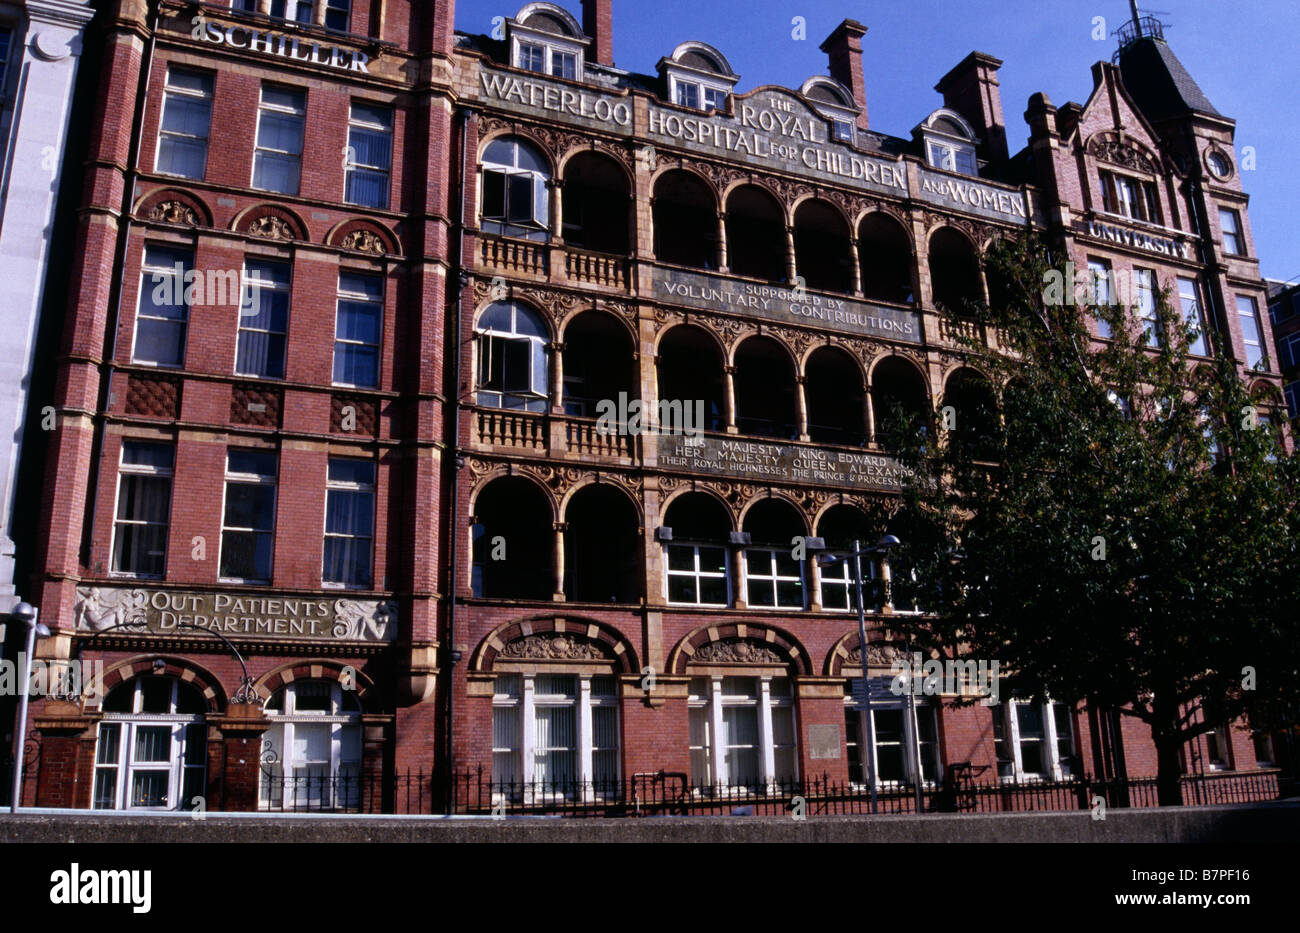 The Schiller International University, formerly Royal Waterloo Stock